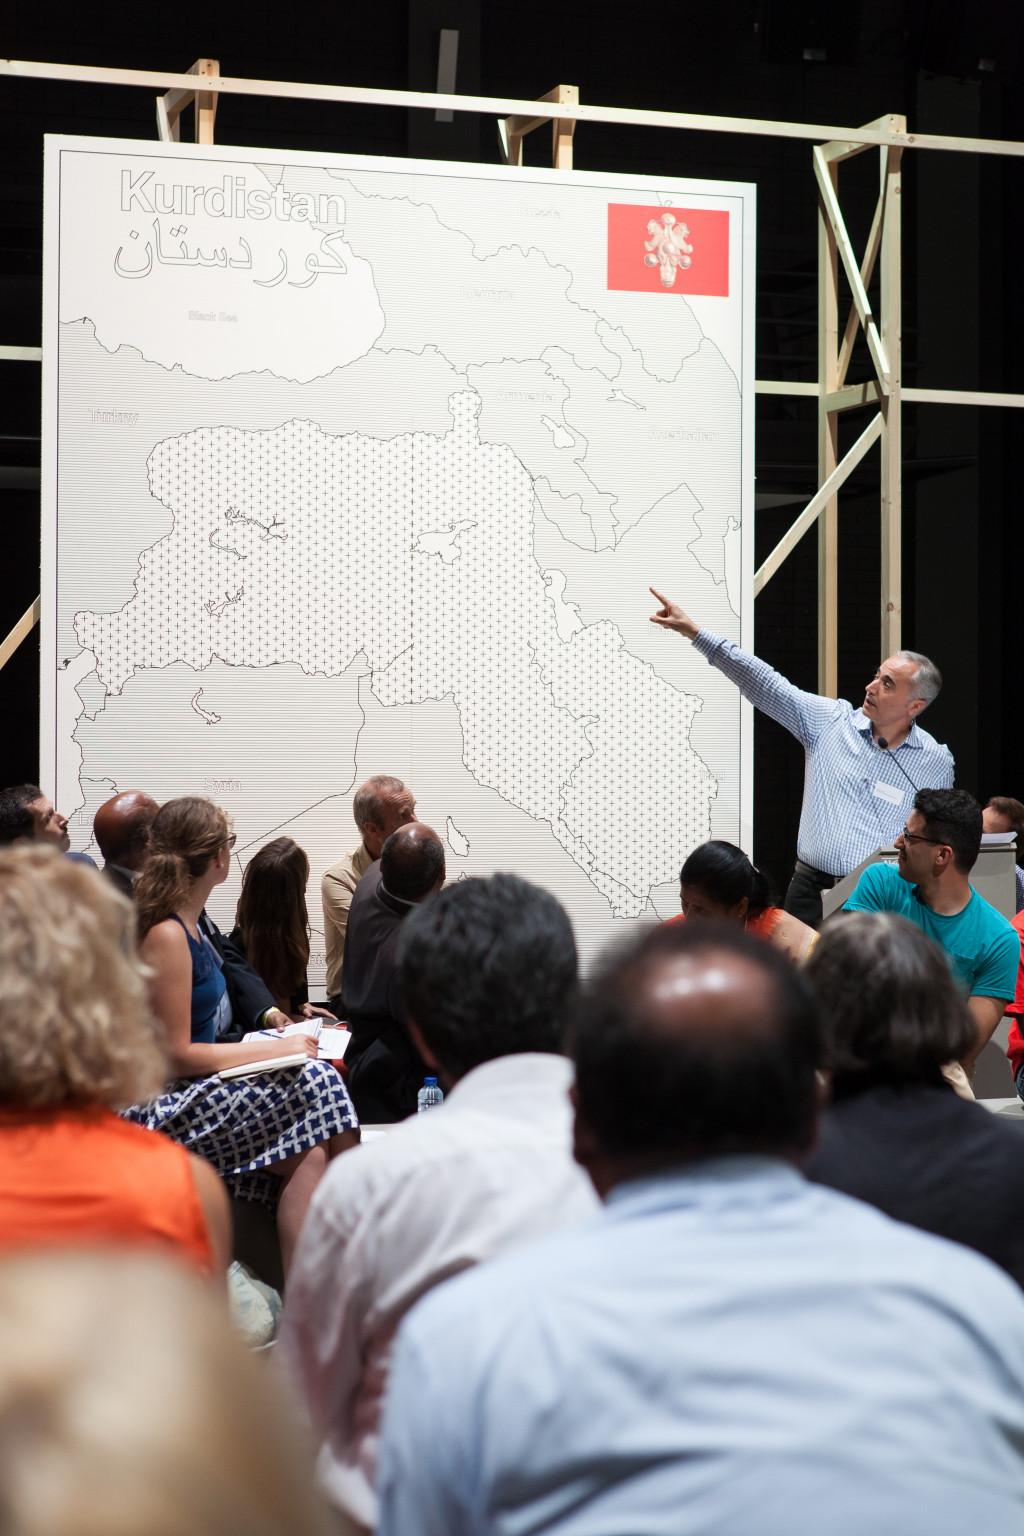 Jonas Staal, 'New World Summit – Brussels', 2014, courtesy de kunstenaar in samenwerking met UNPO, et al. Foto: Ernie Buts